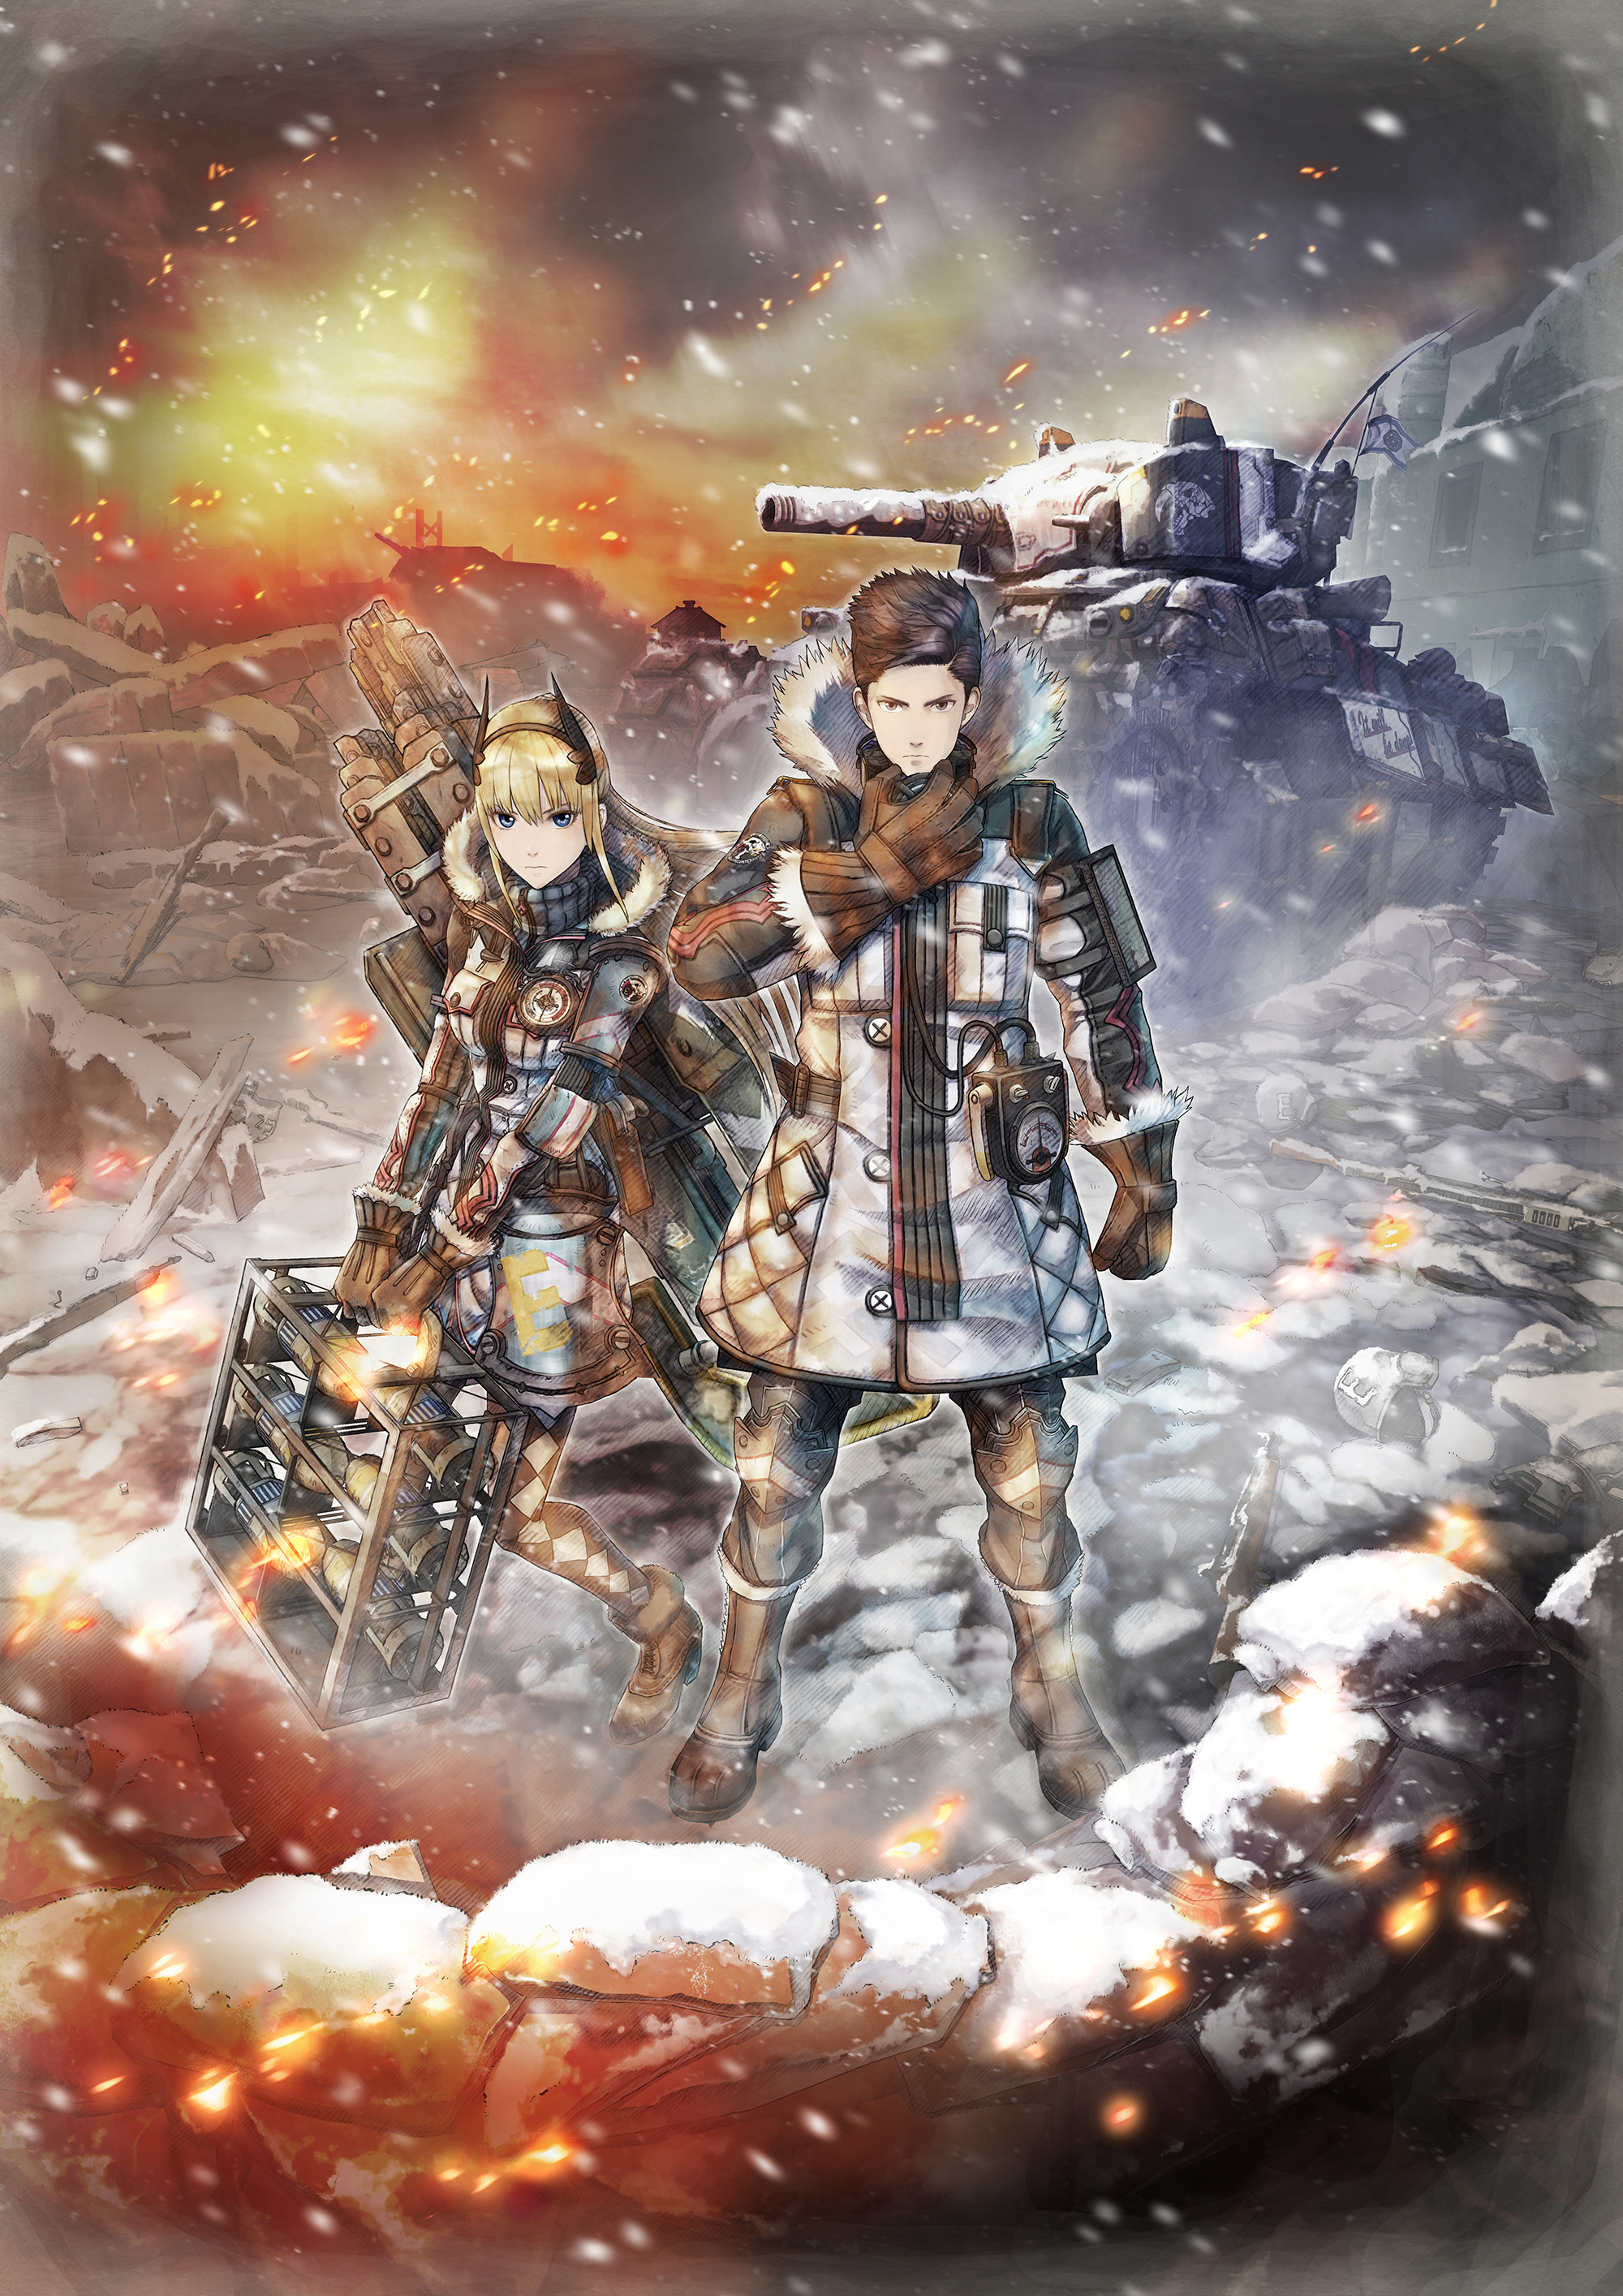 Valkyria Chronicles 4 - key art